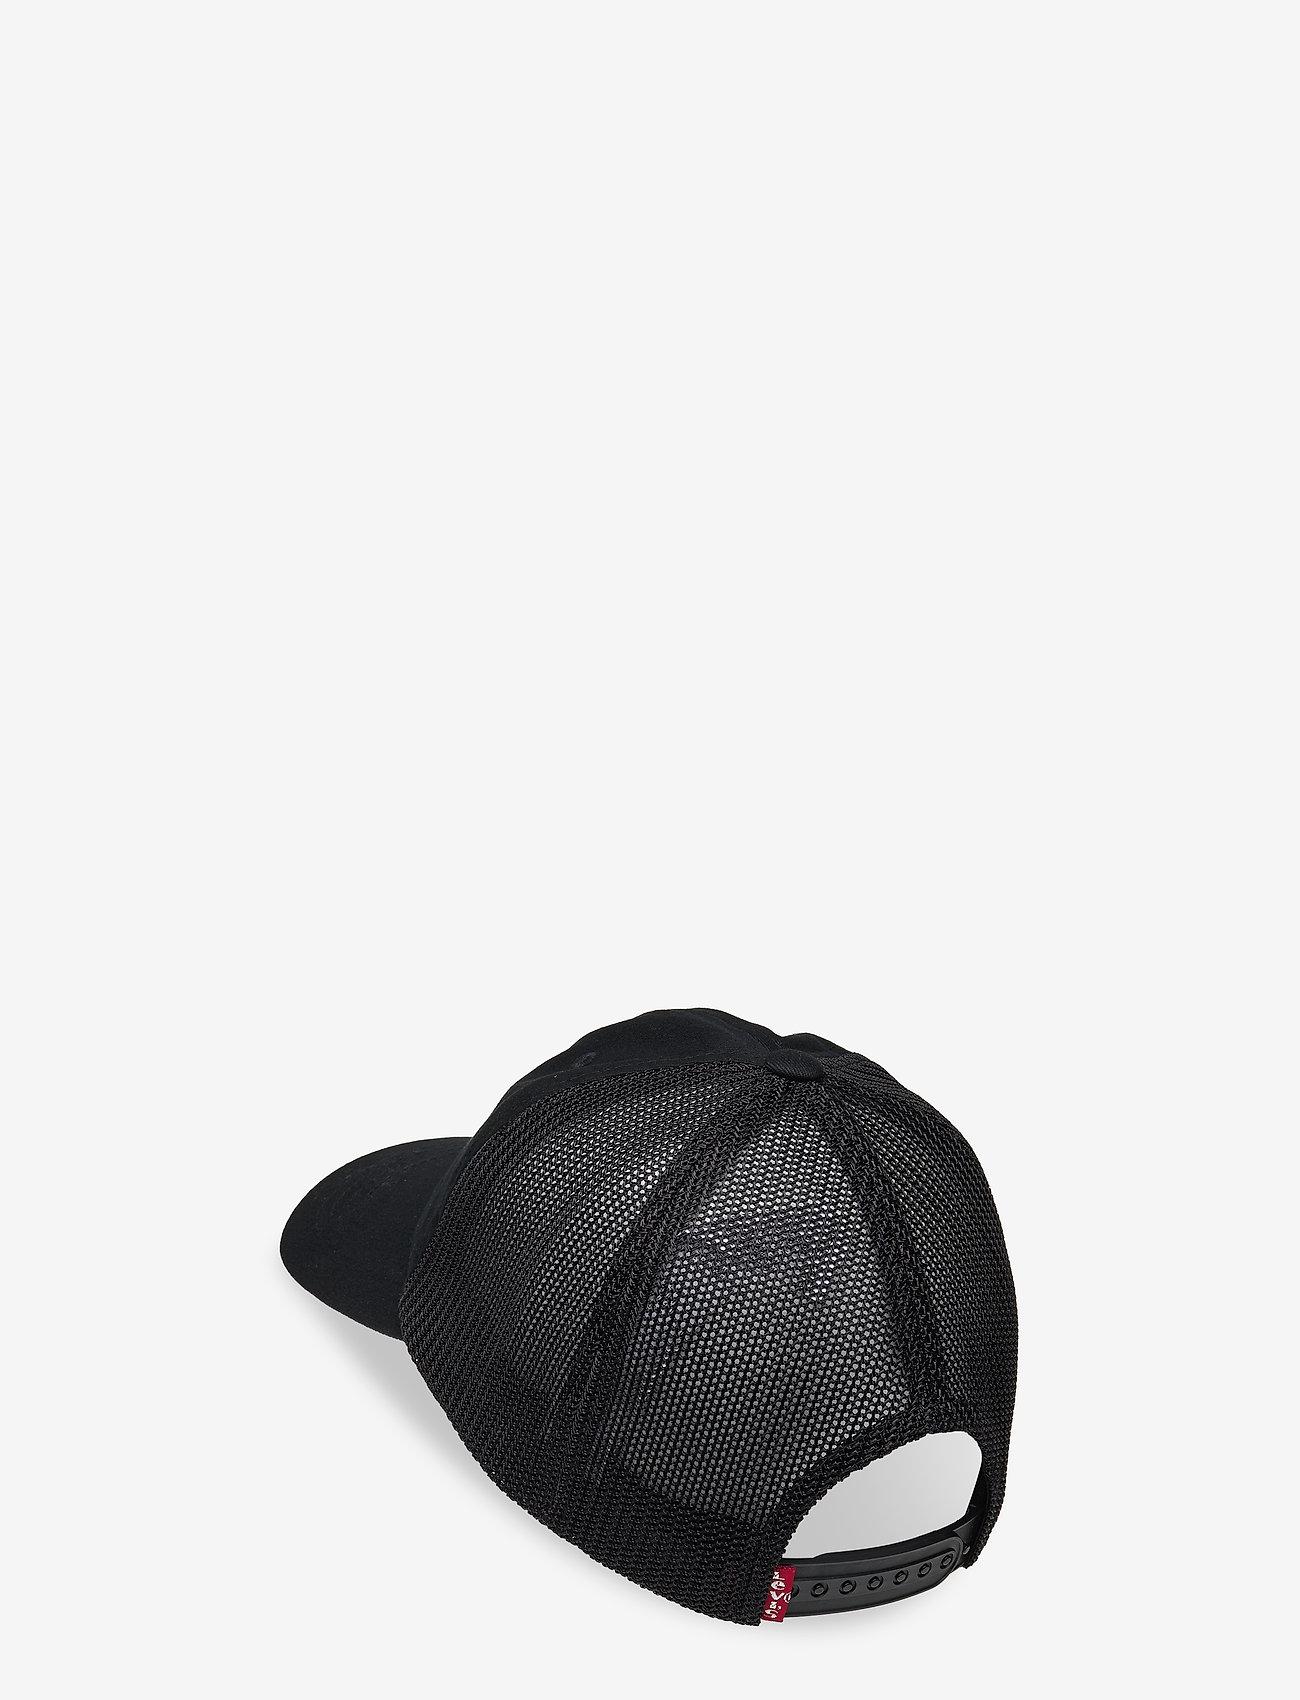 Levi's Footwear & Acc - MESH BACK BASEBALL CAP - VINTAGE MODERN - casquettes - regular black - 1